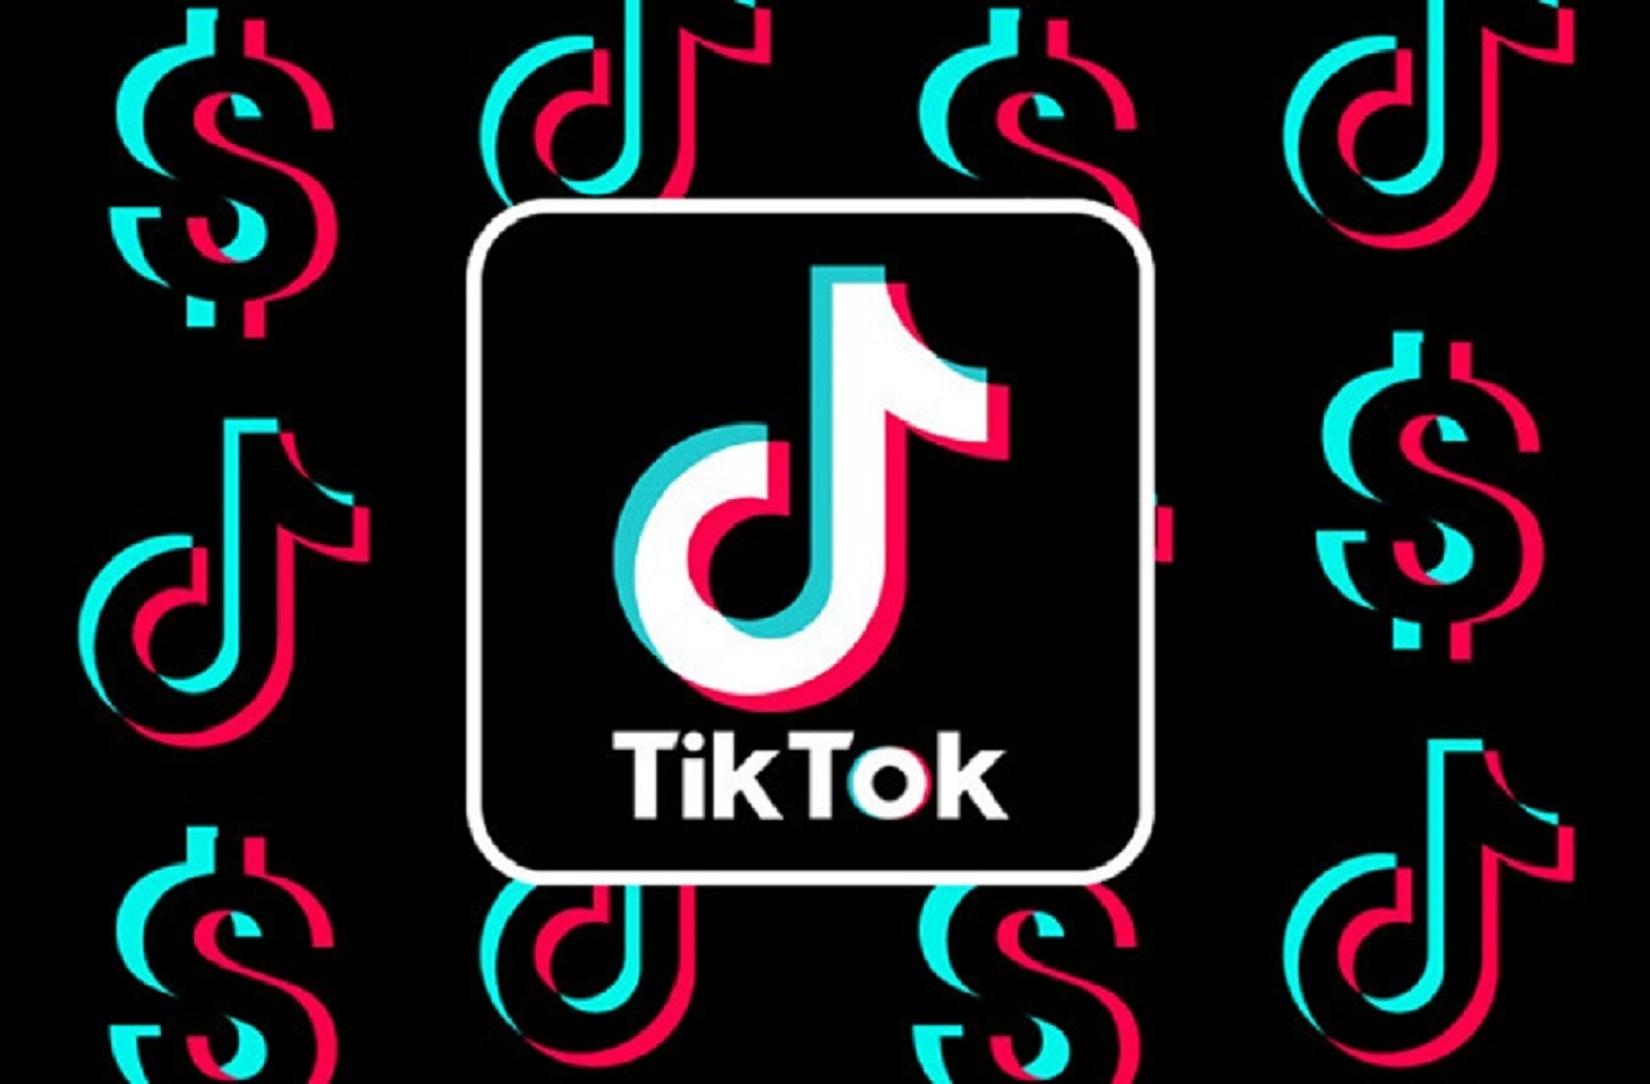 США отложили на 15 дней крайний срок заключения сделки по TikTok